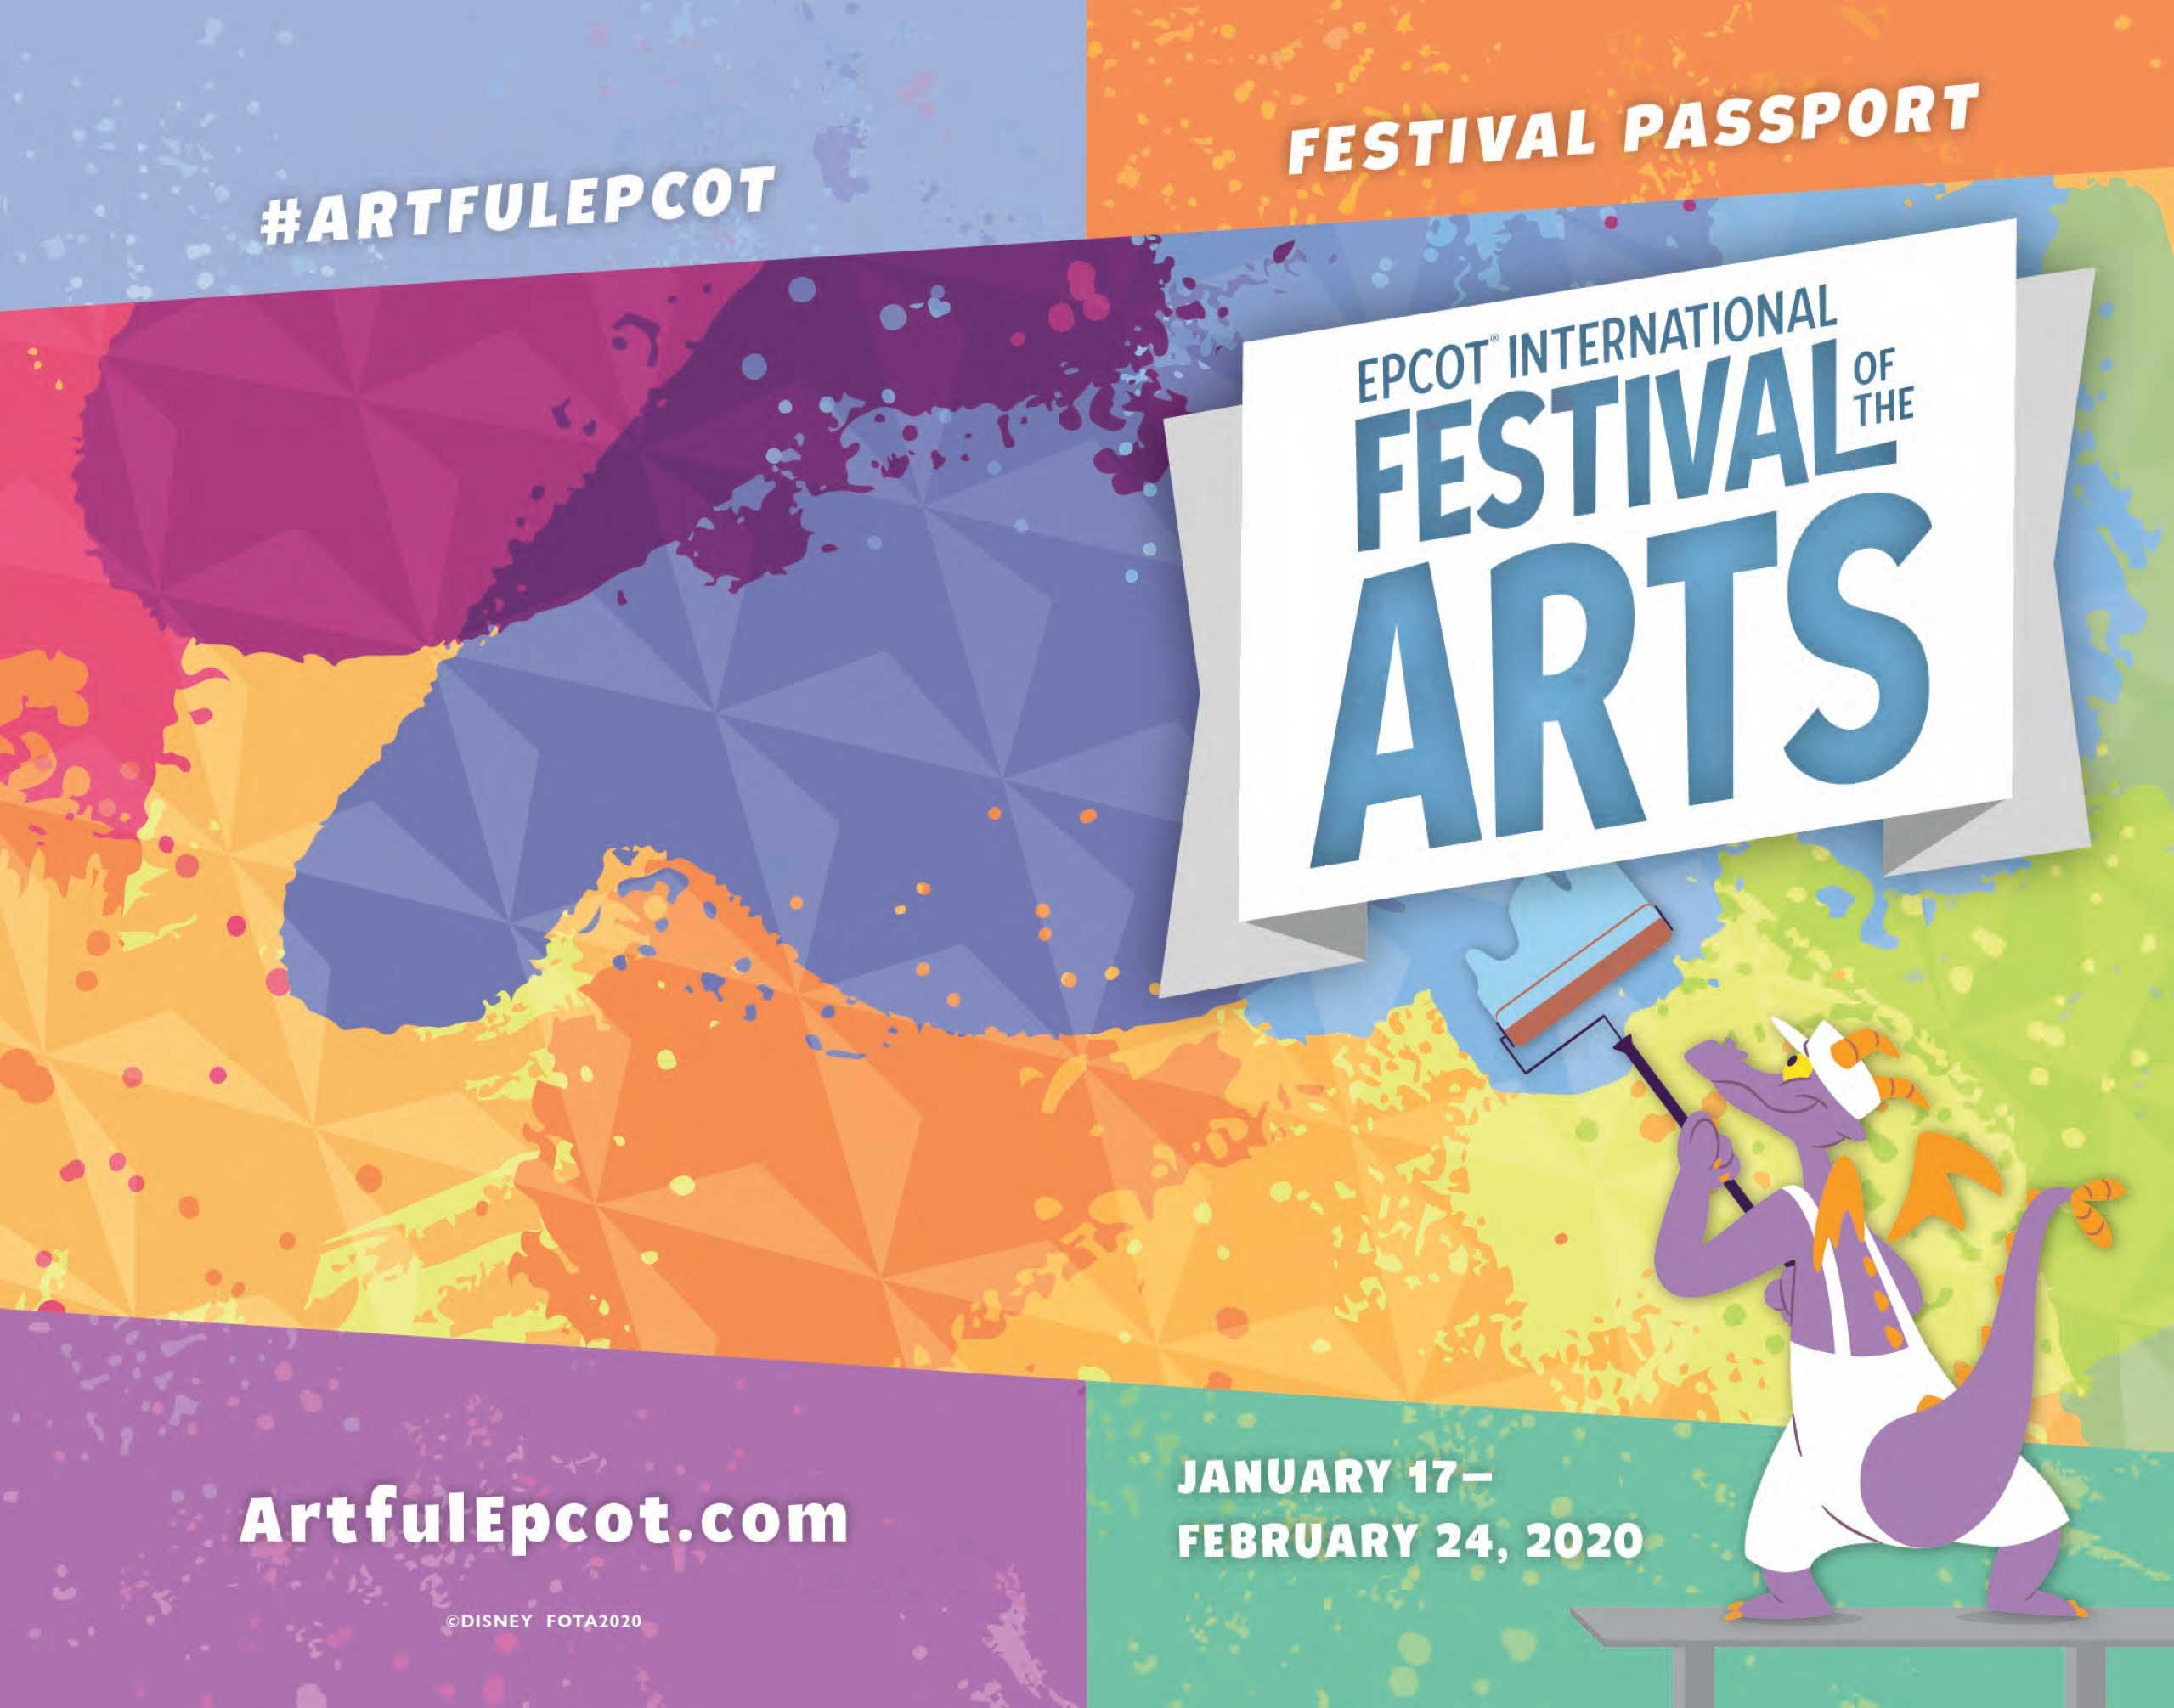 2020 Epcot Festival of the Arts Passport